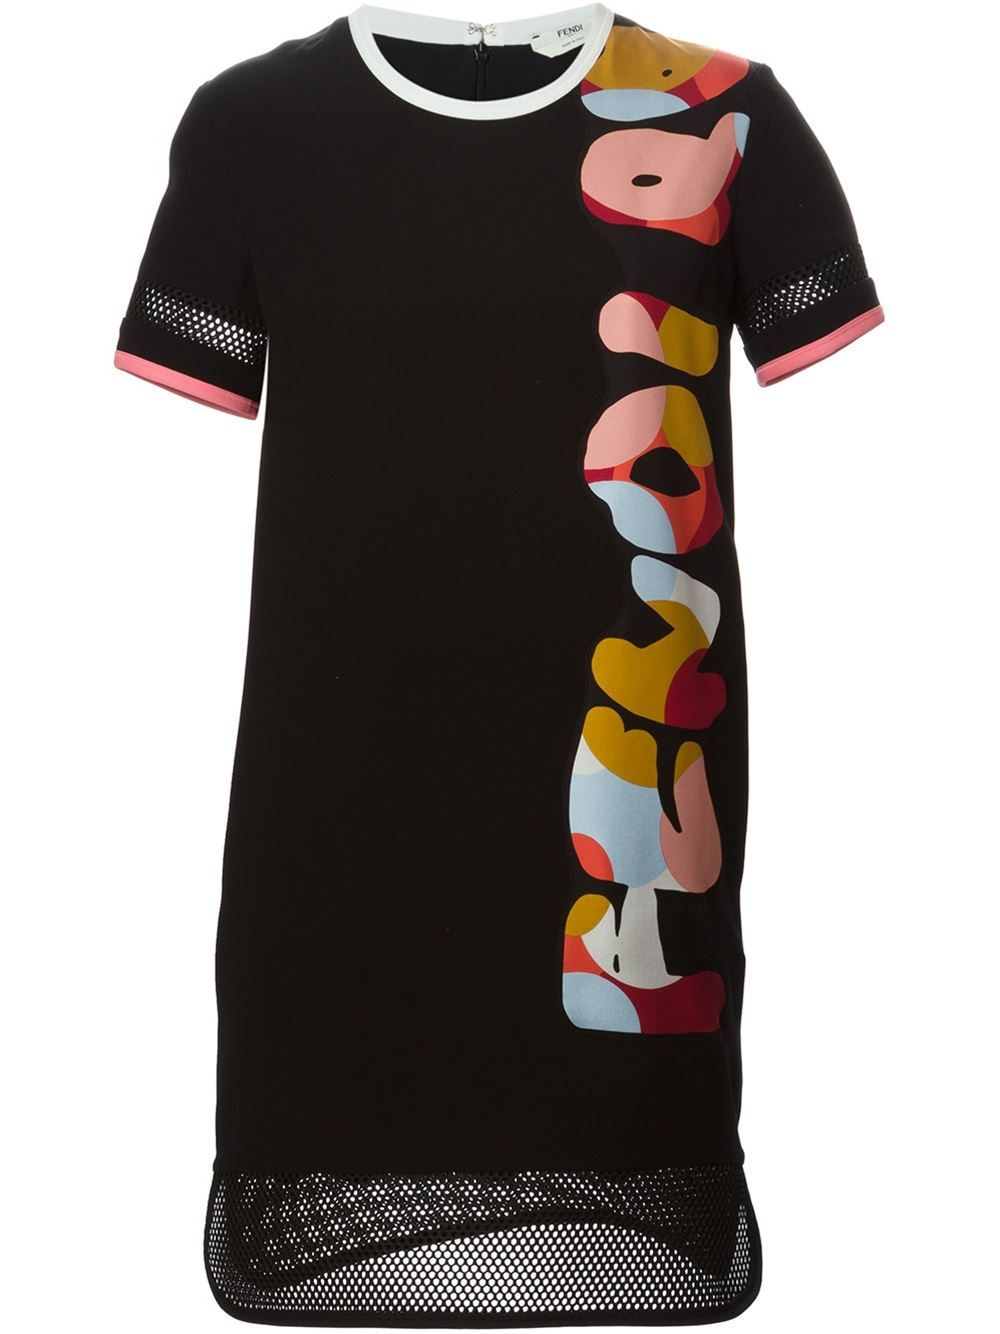 Fendi Mesh Trim Jersey Dress - Gaudenzi - Farfetch.com